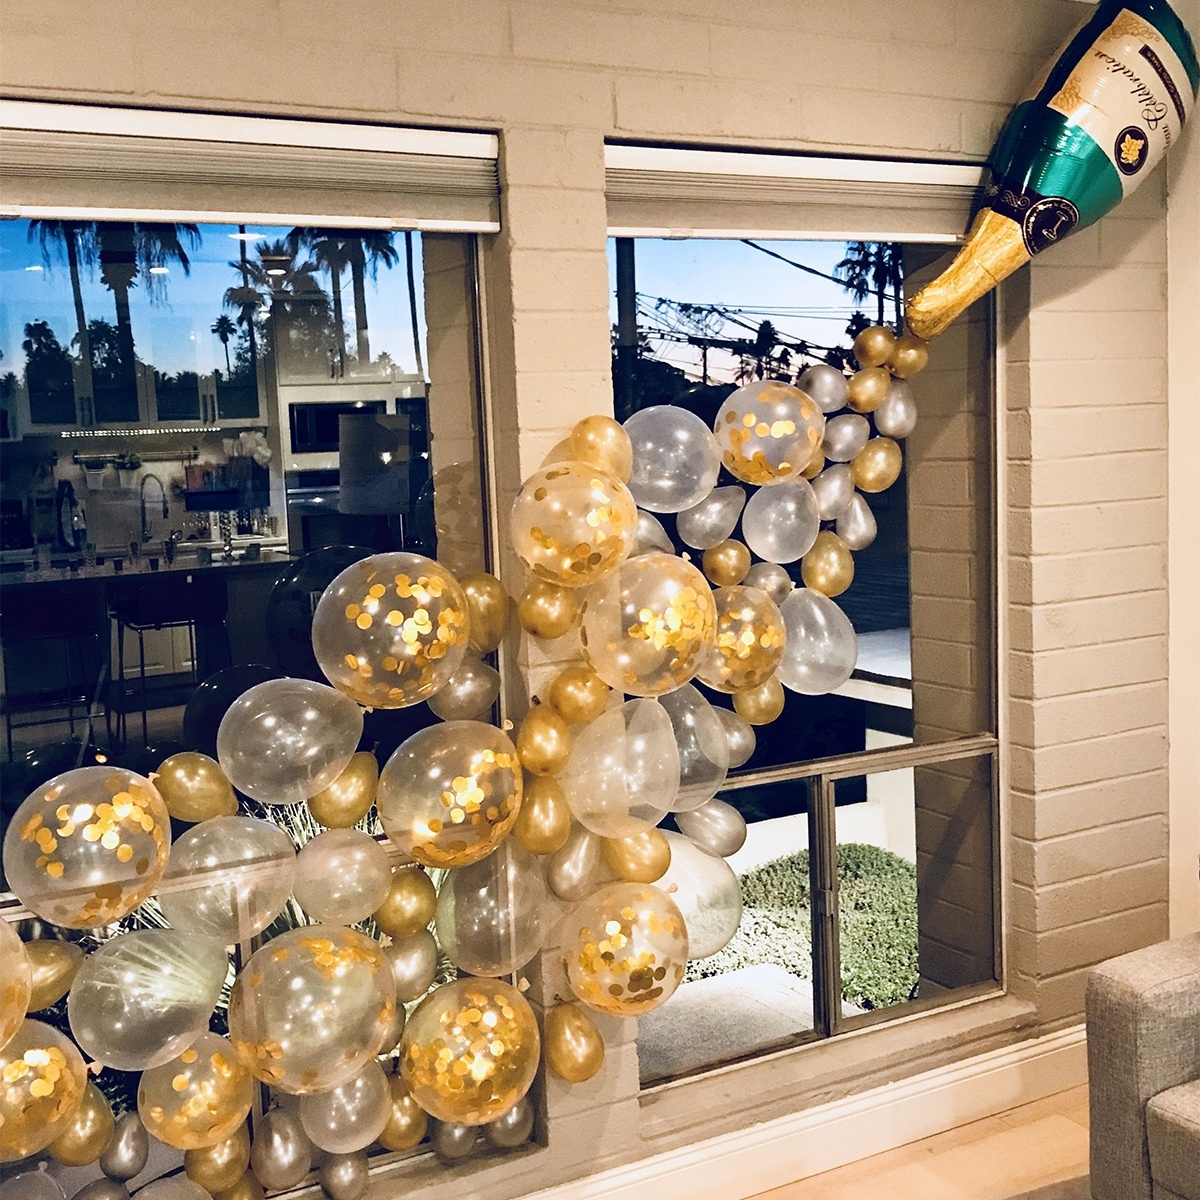 Champagne-flessenballon 1pc & decoratieve ballonset 25st